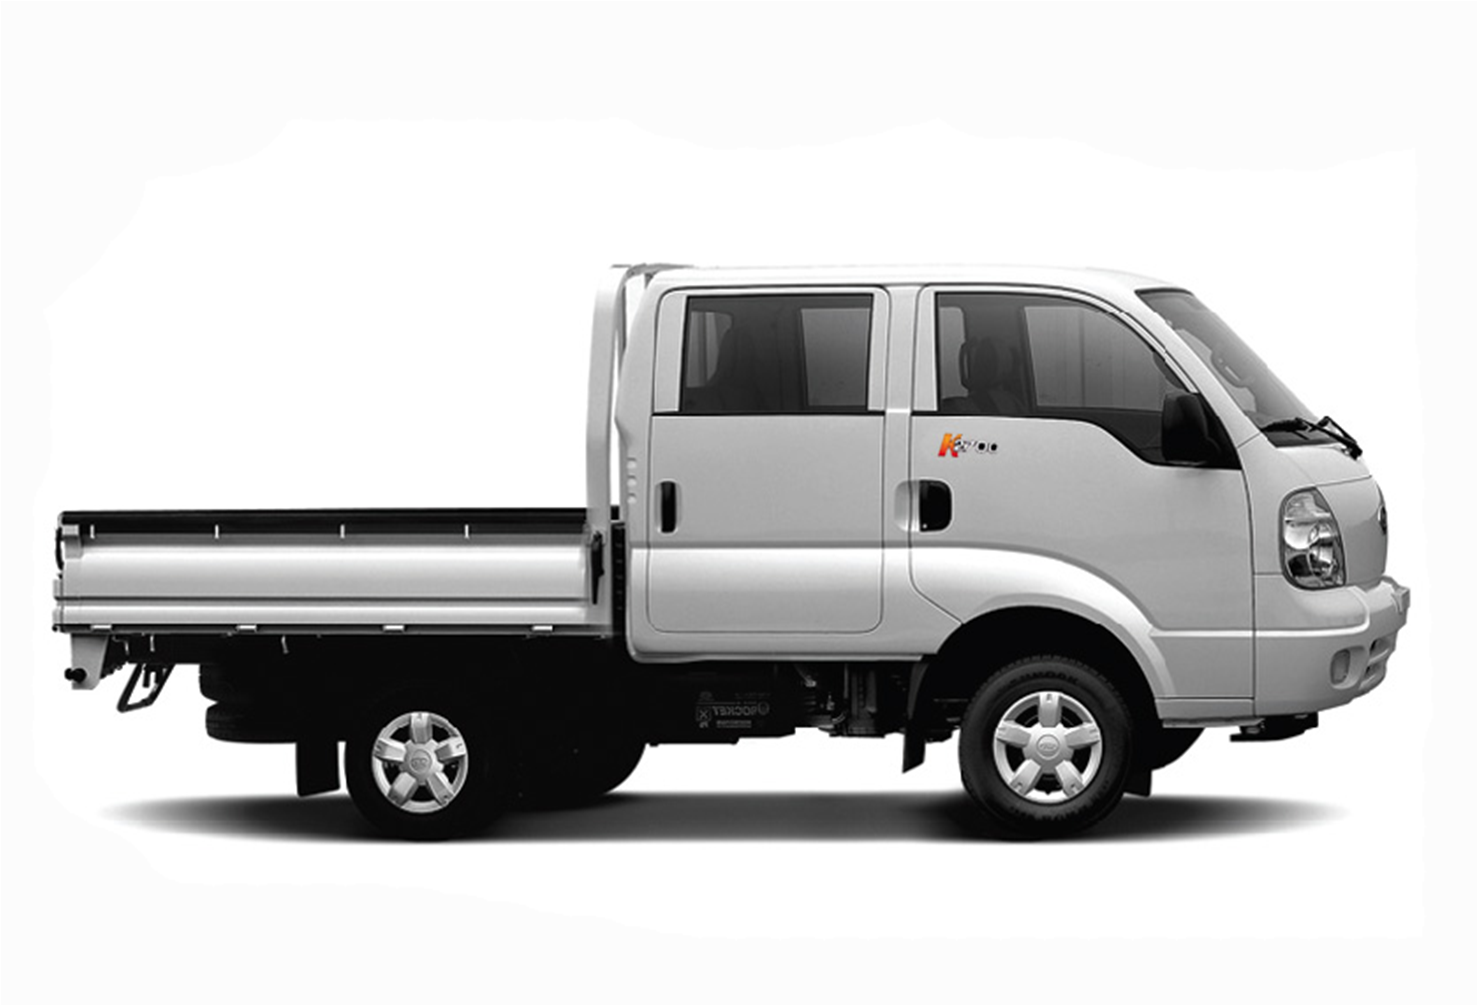 Kia K2700 4x4 Double Cab Trucks Vans Wagons Pinterest – Kia K2700 Engine Diagram